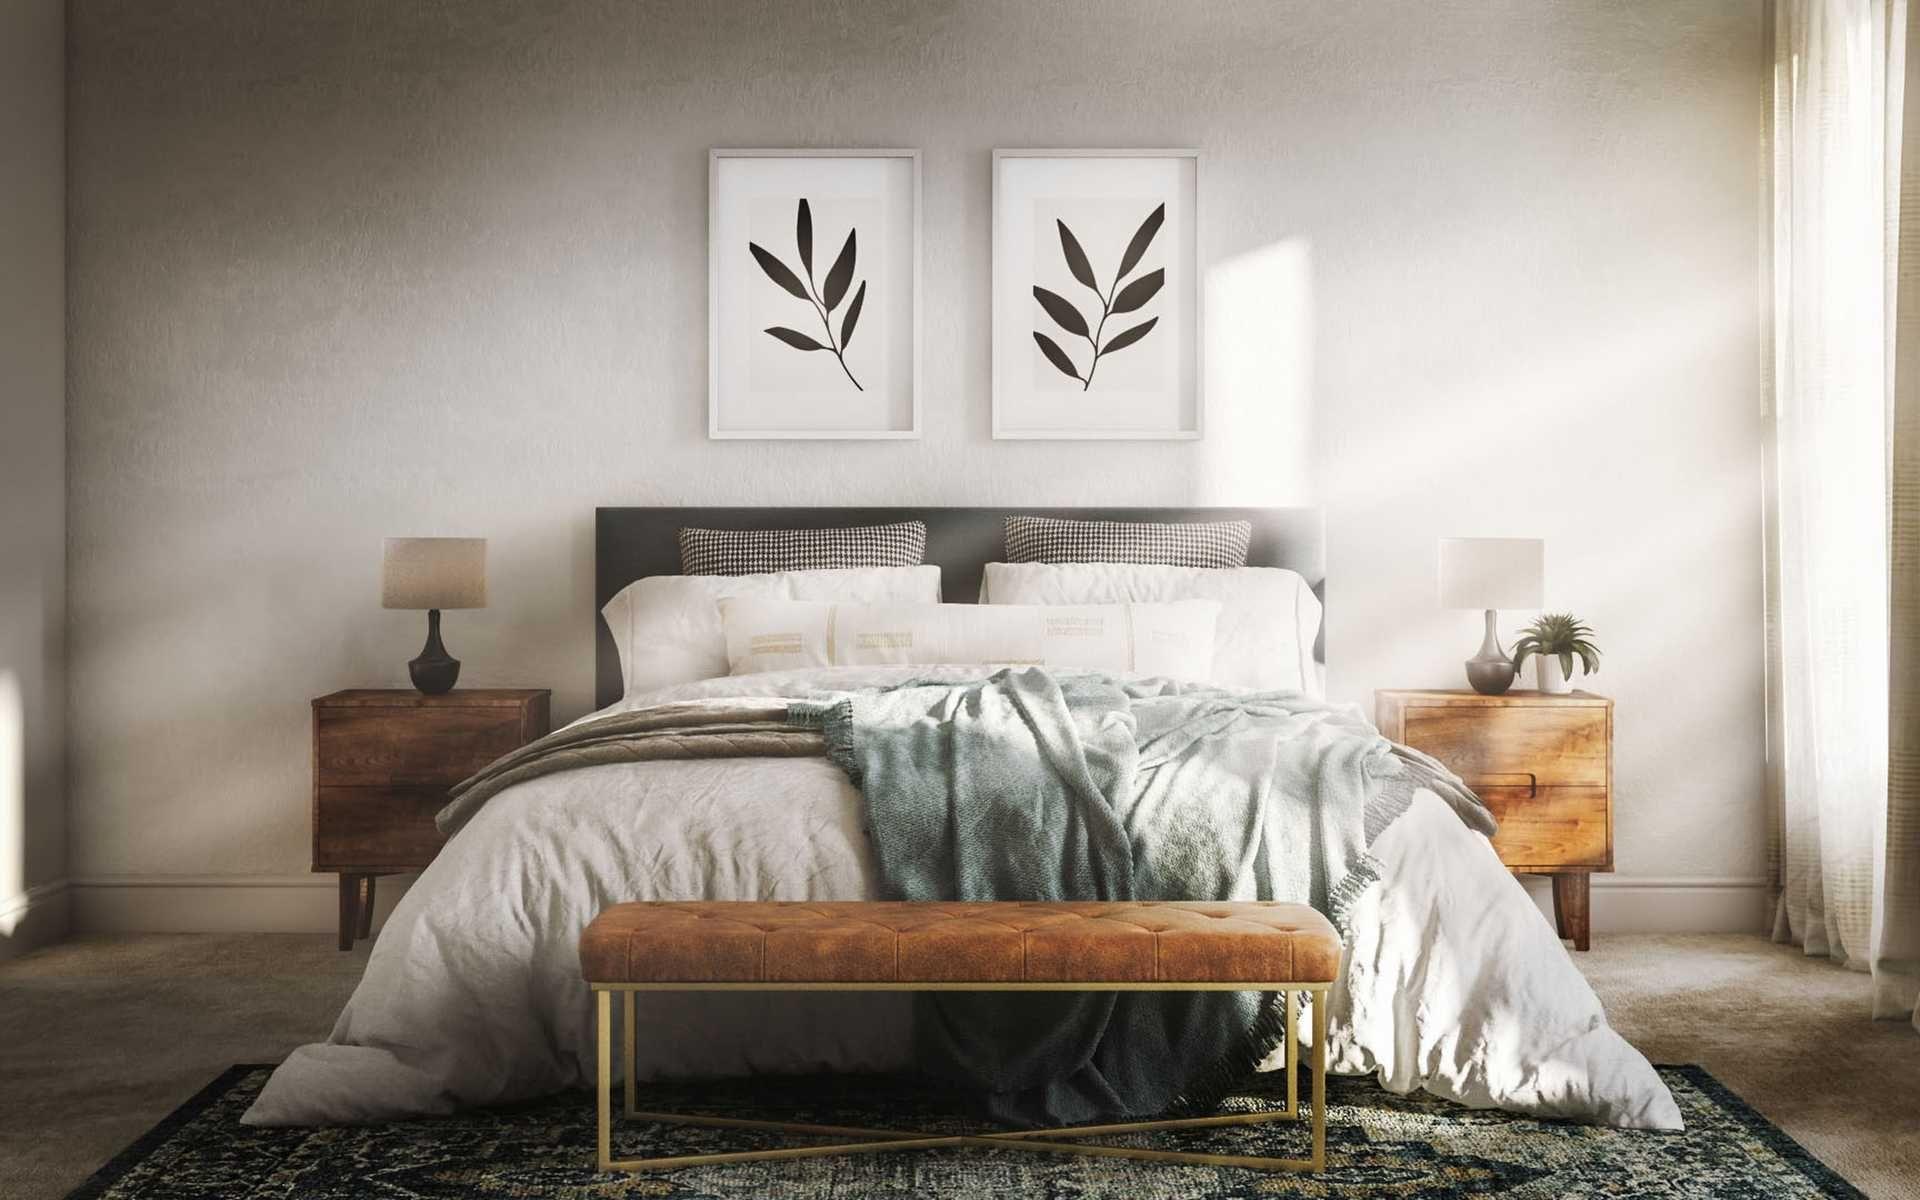 Bedroom Design By Havenly Interior Designer Robyn In 2021 Bedroom Interior Interior Design Bedroom Online Interior Design